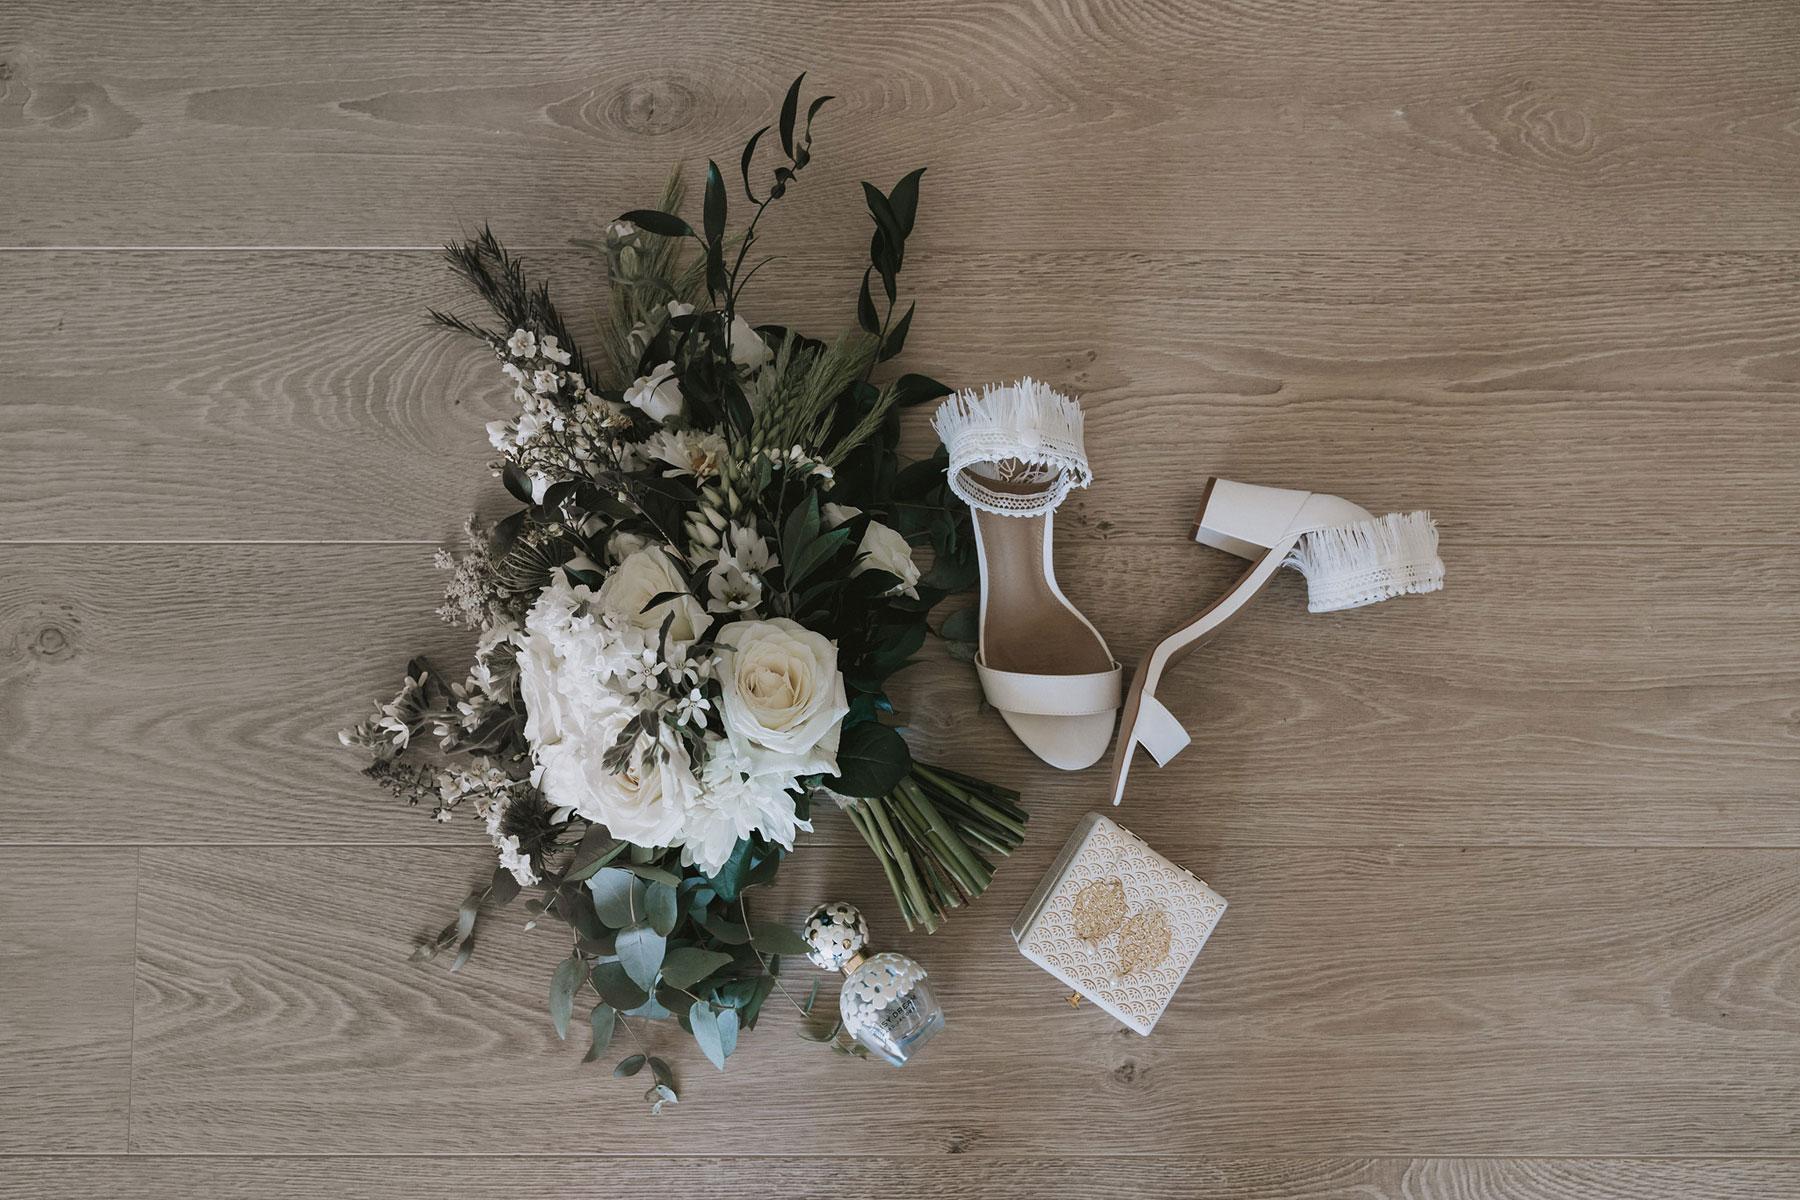 newfound-j-n-orua-beach-house-coromandel-wedding-photographers-81